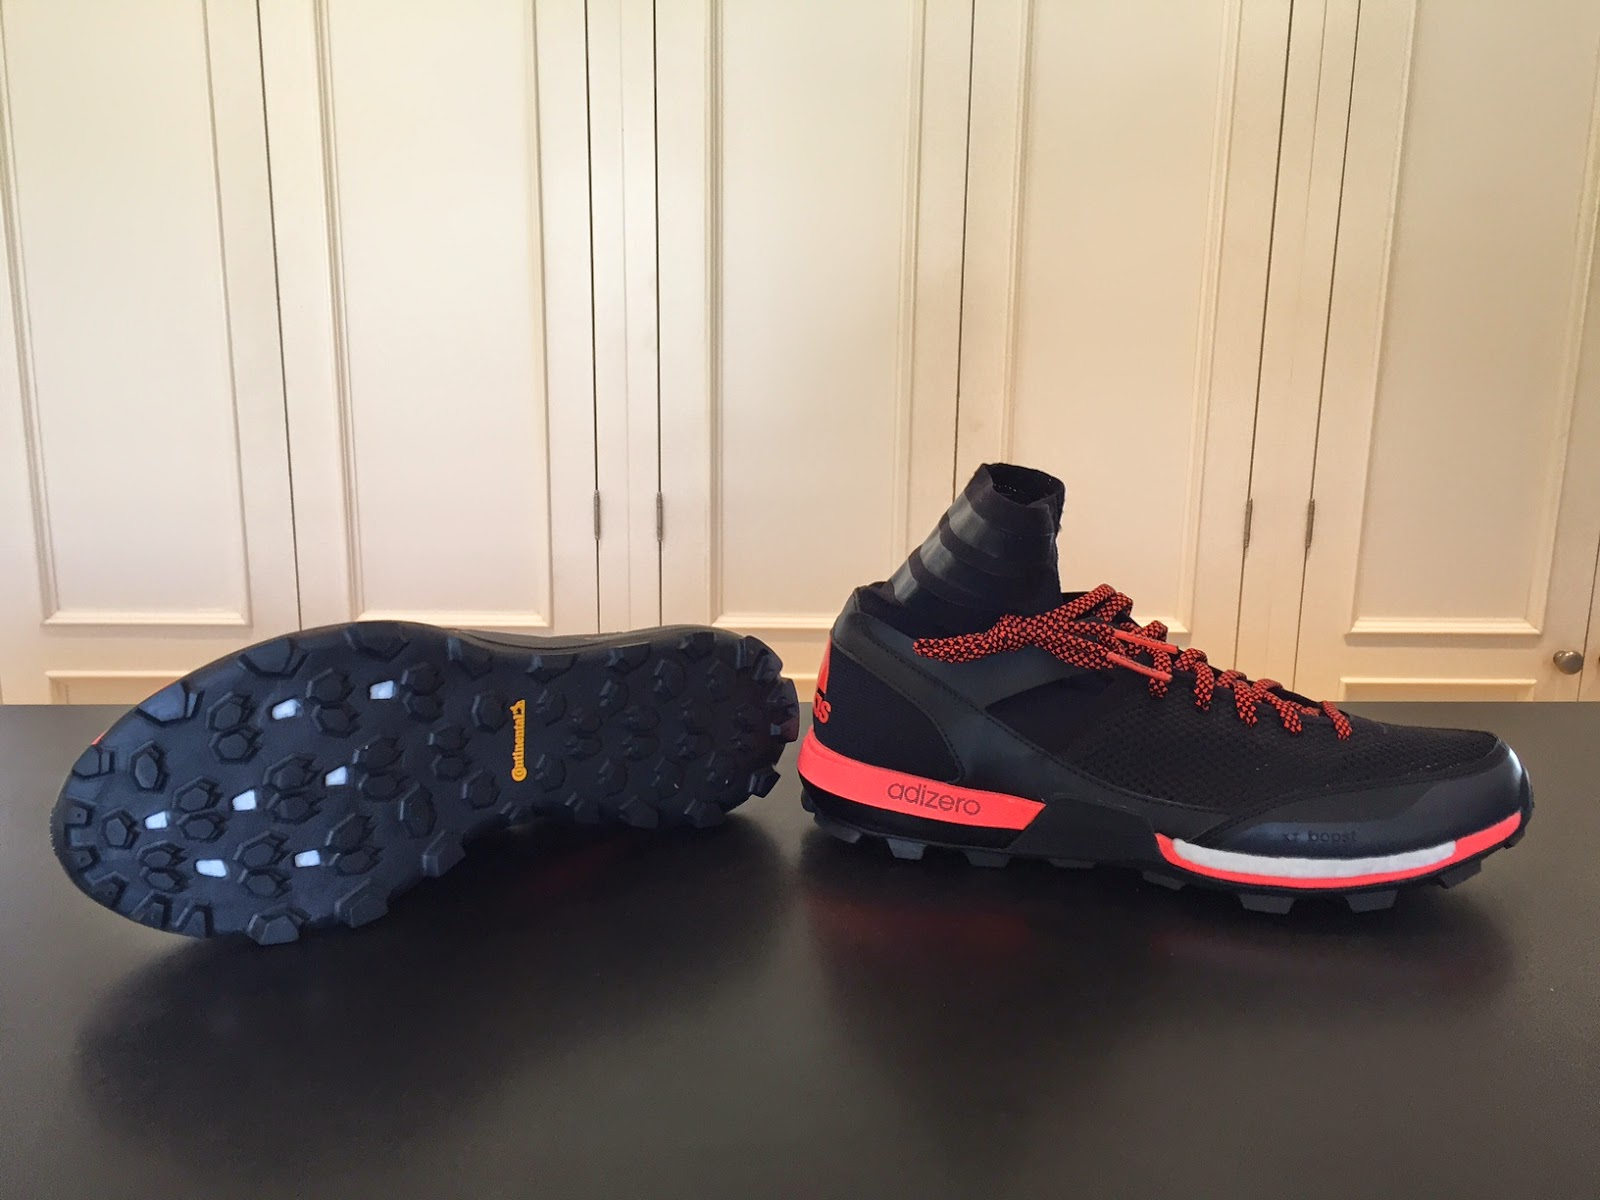 e88363d930f5 Road Trail Run  Trail Shoe Roundup- Pre-Review First Runs  Montrail ...